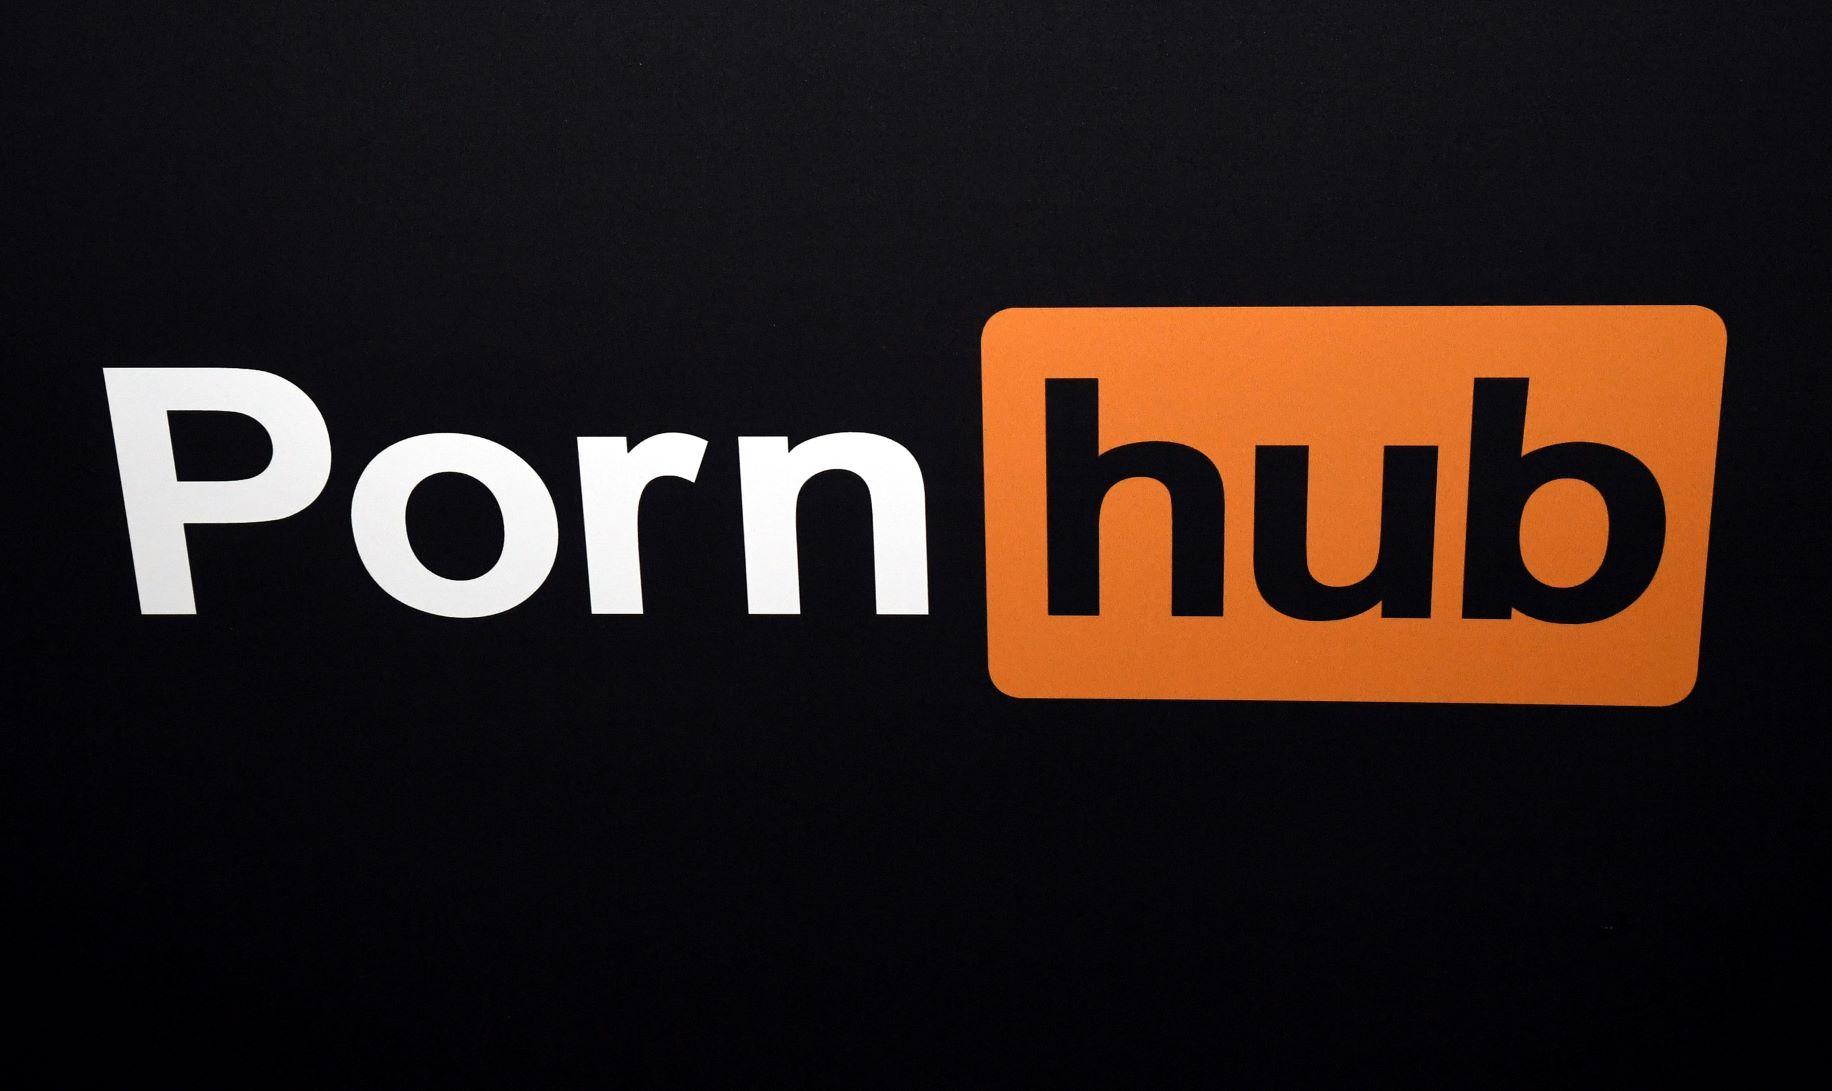 PornHub producirá un documental que no será pornográfico